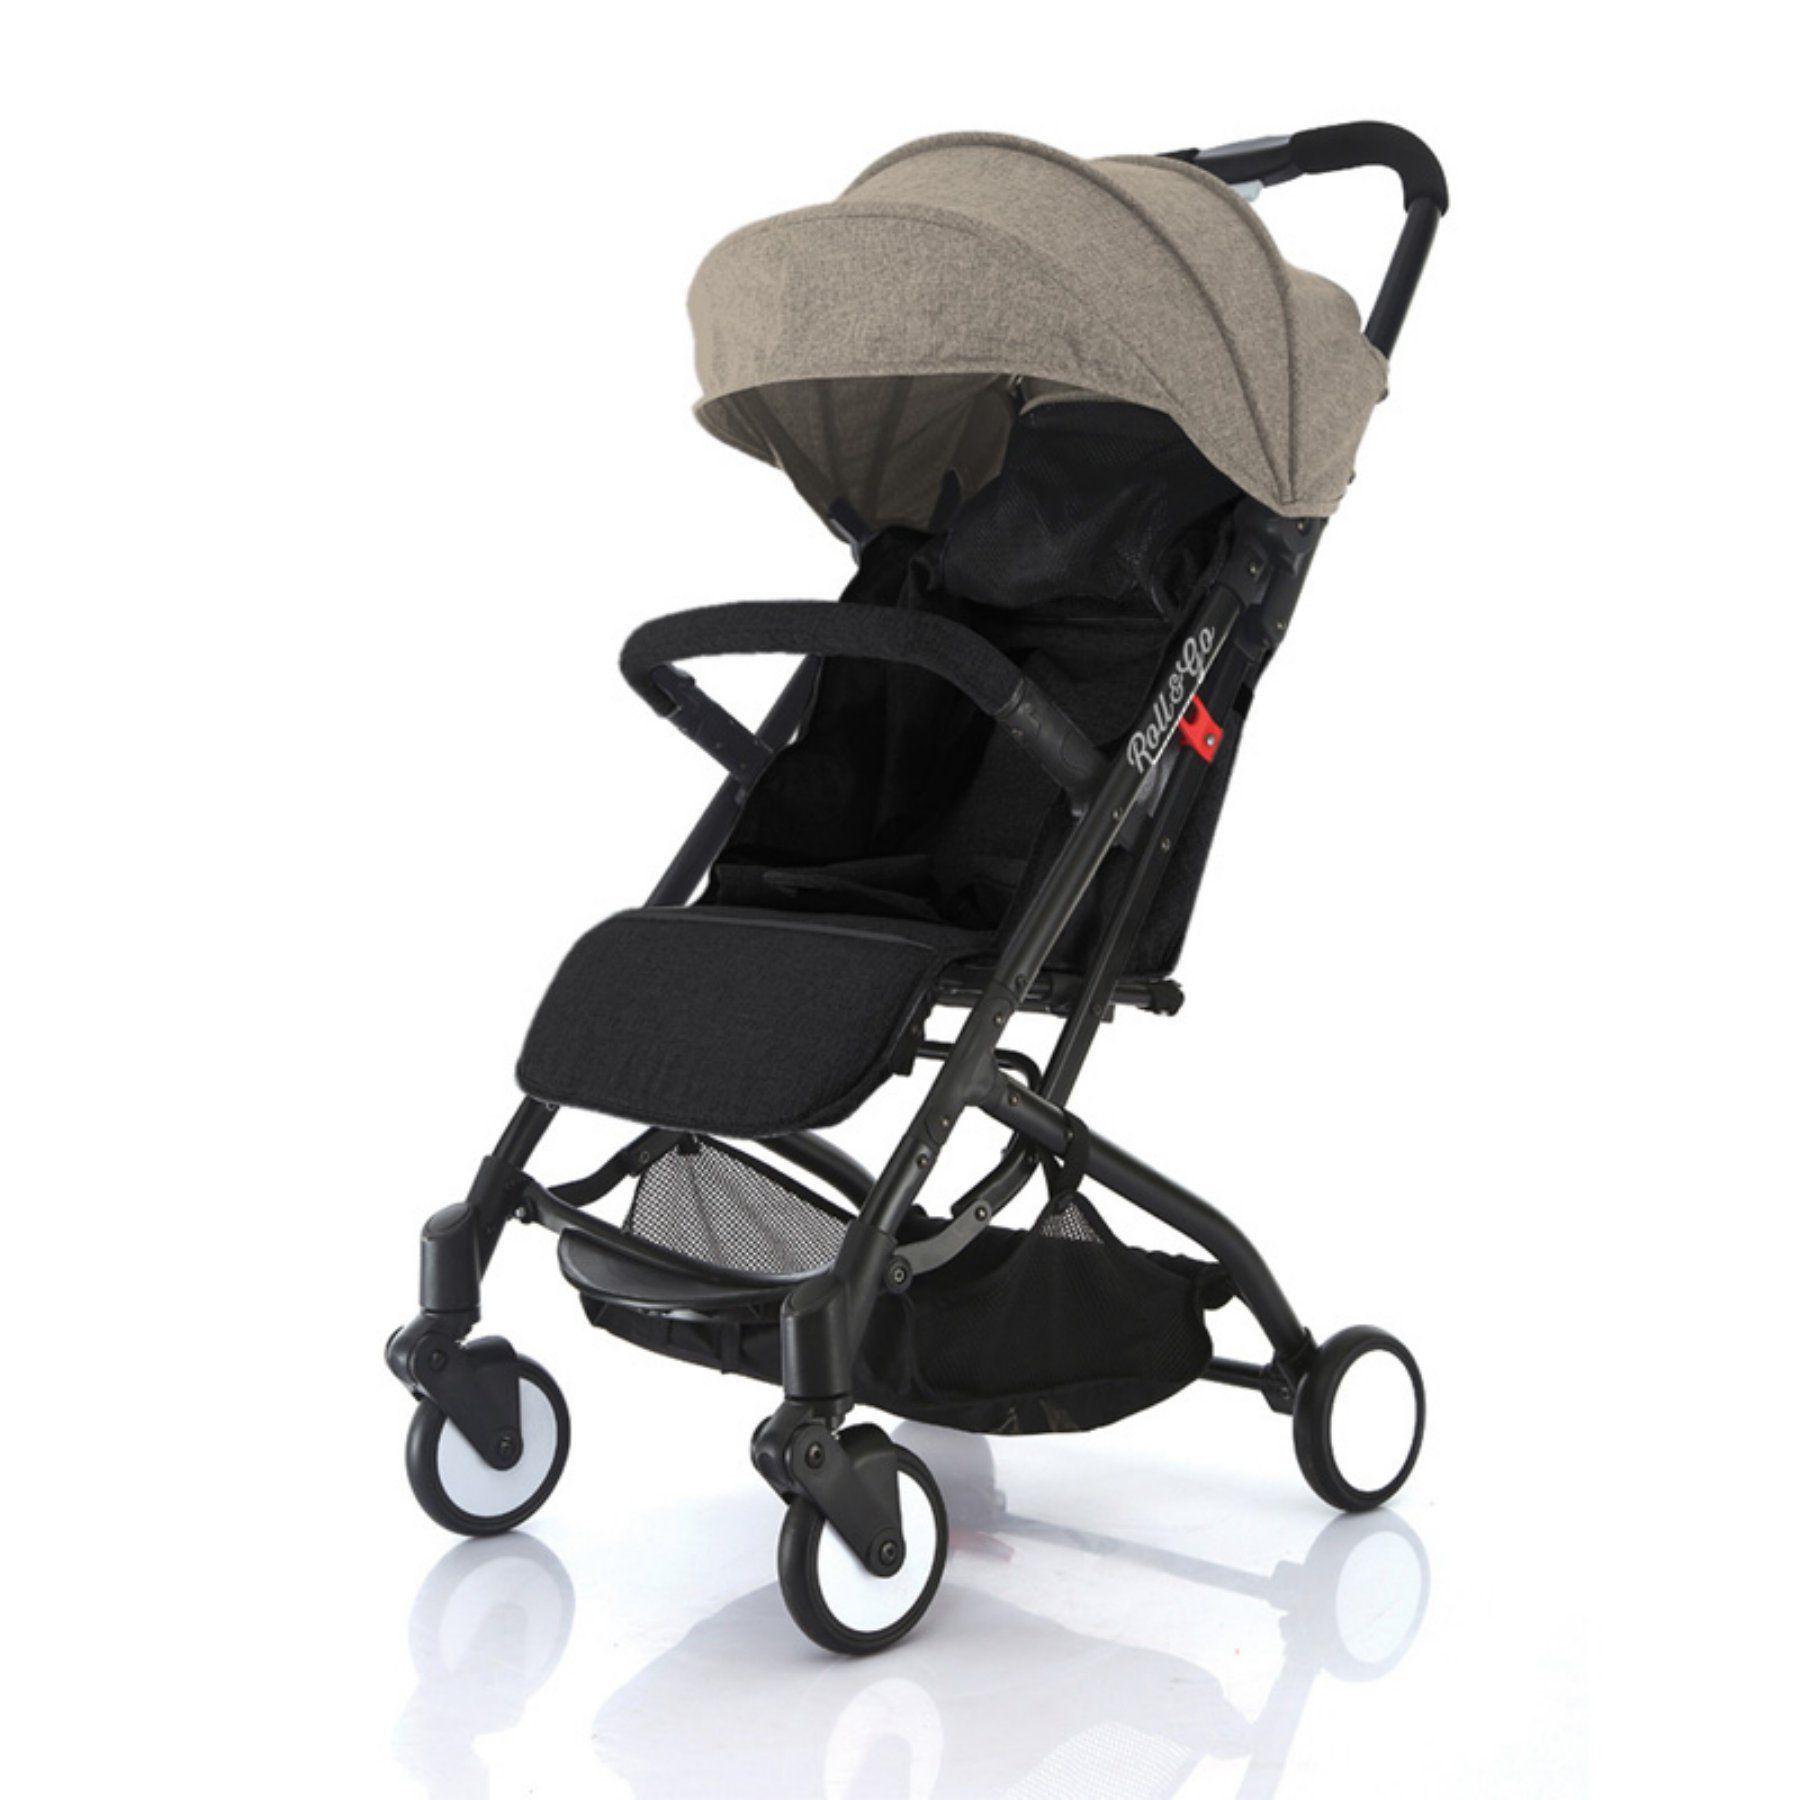 Babyroues Roll & Go Lightweight Stroller Black/Tan